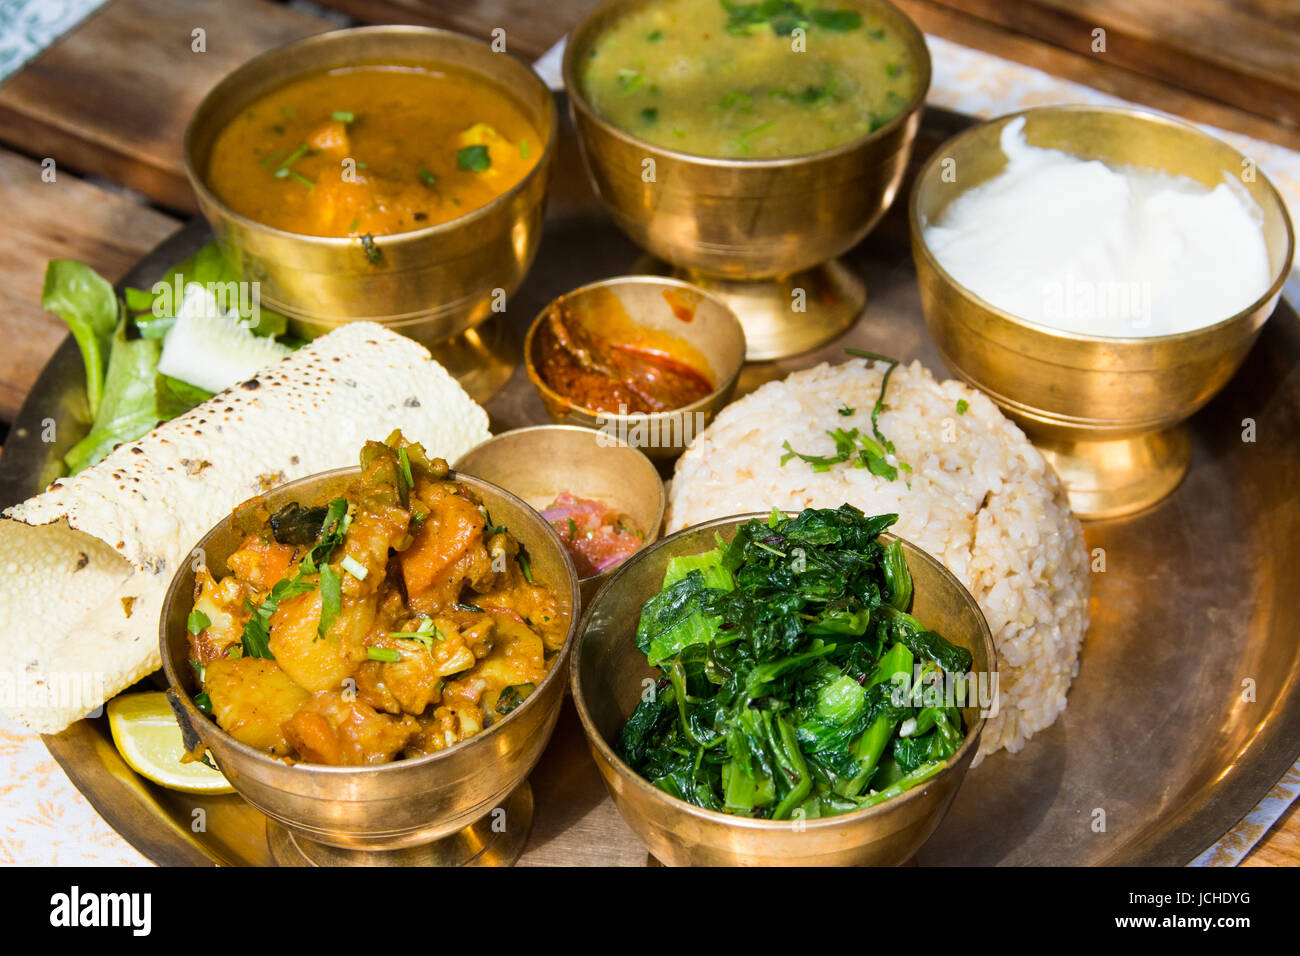 Nepali Thali, traditional meal, Cafe Swotha, Patan (Lalitpur), Kathmandu, Nepal - Stock Image